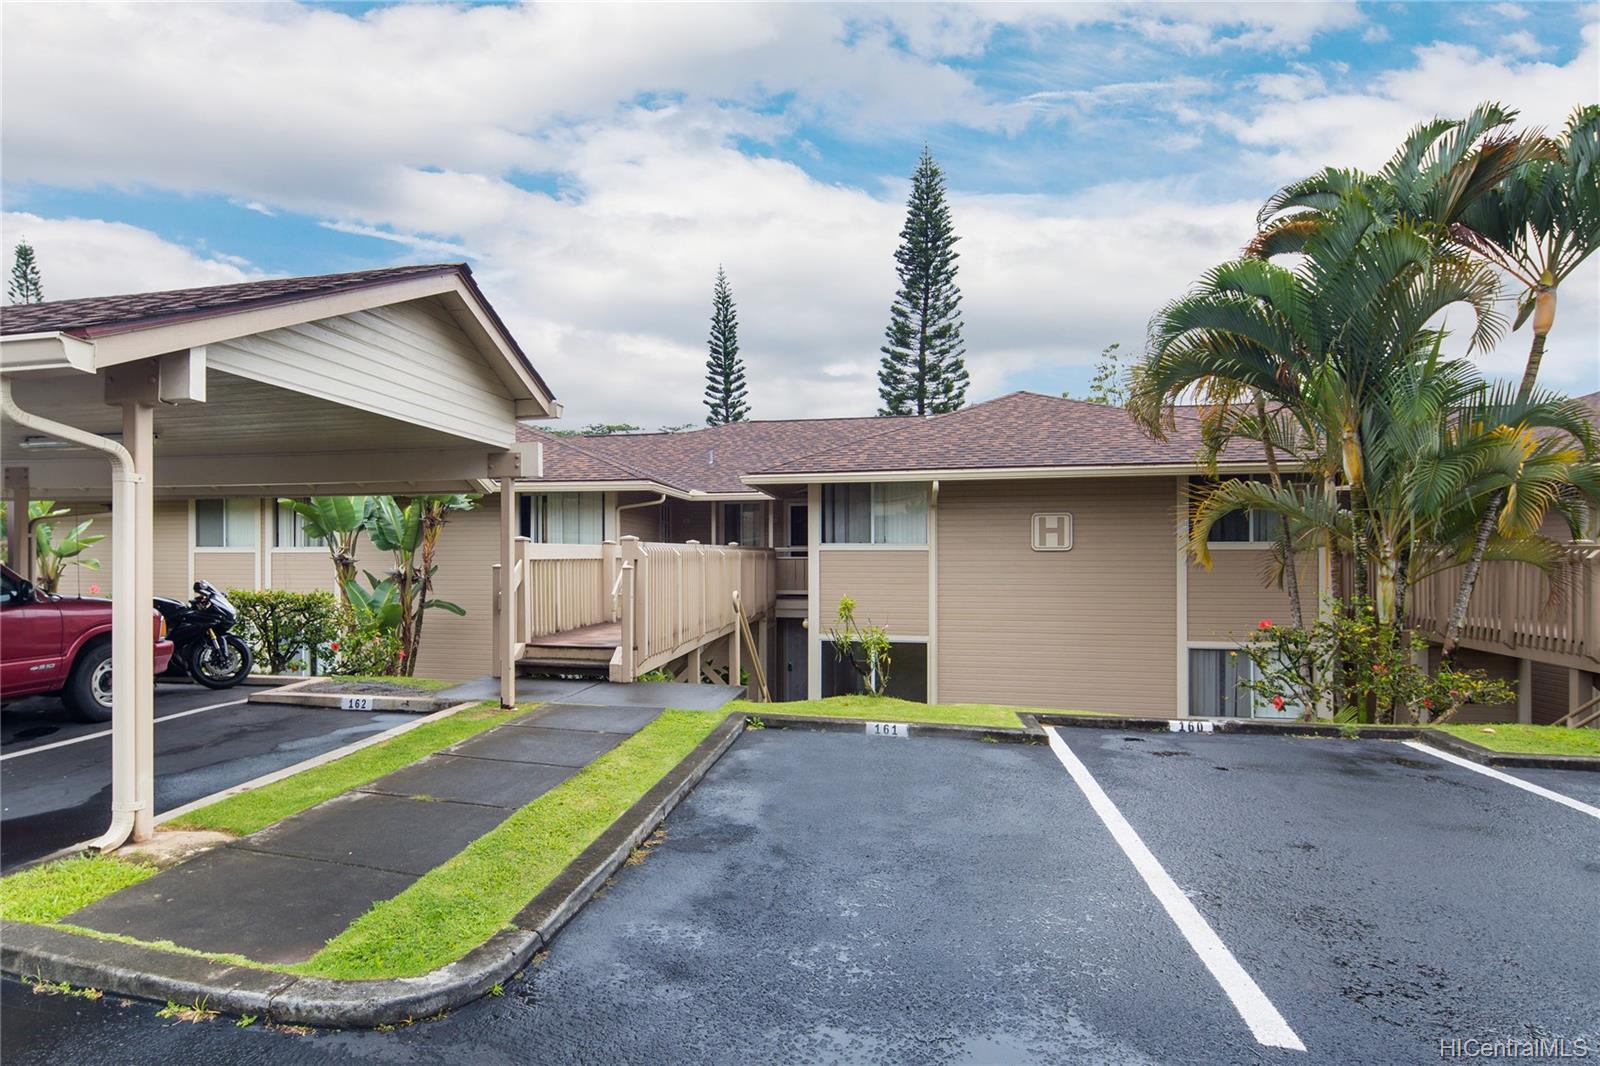 95-510 Wikao Street townhouse # H103, Mililani, Hawaii - photo 14 of 18